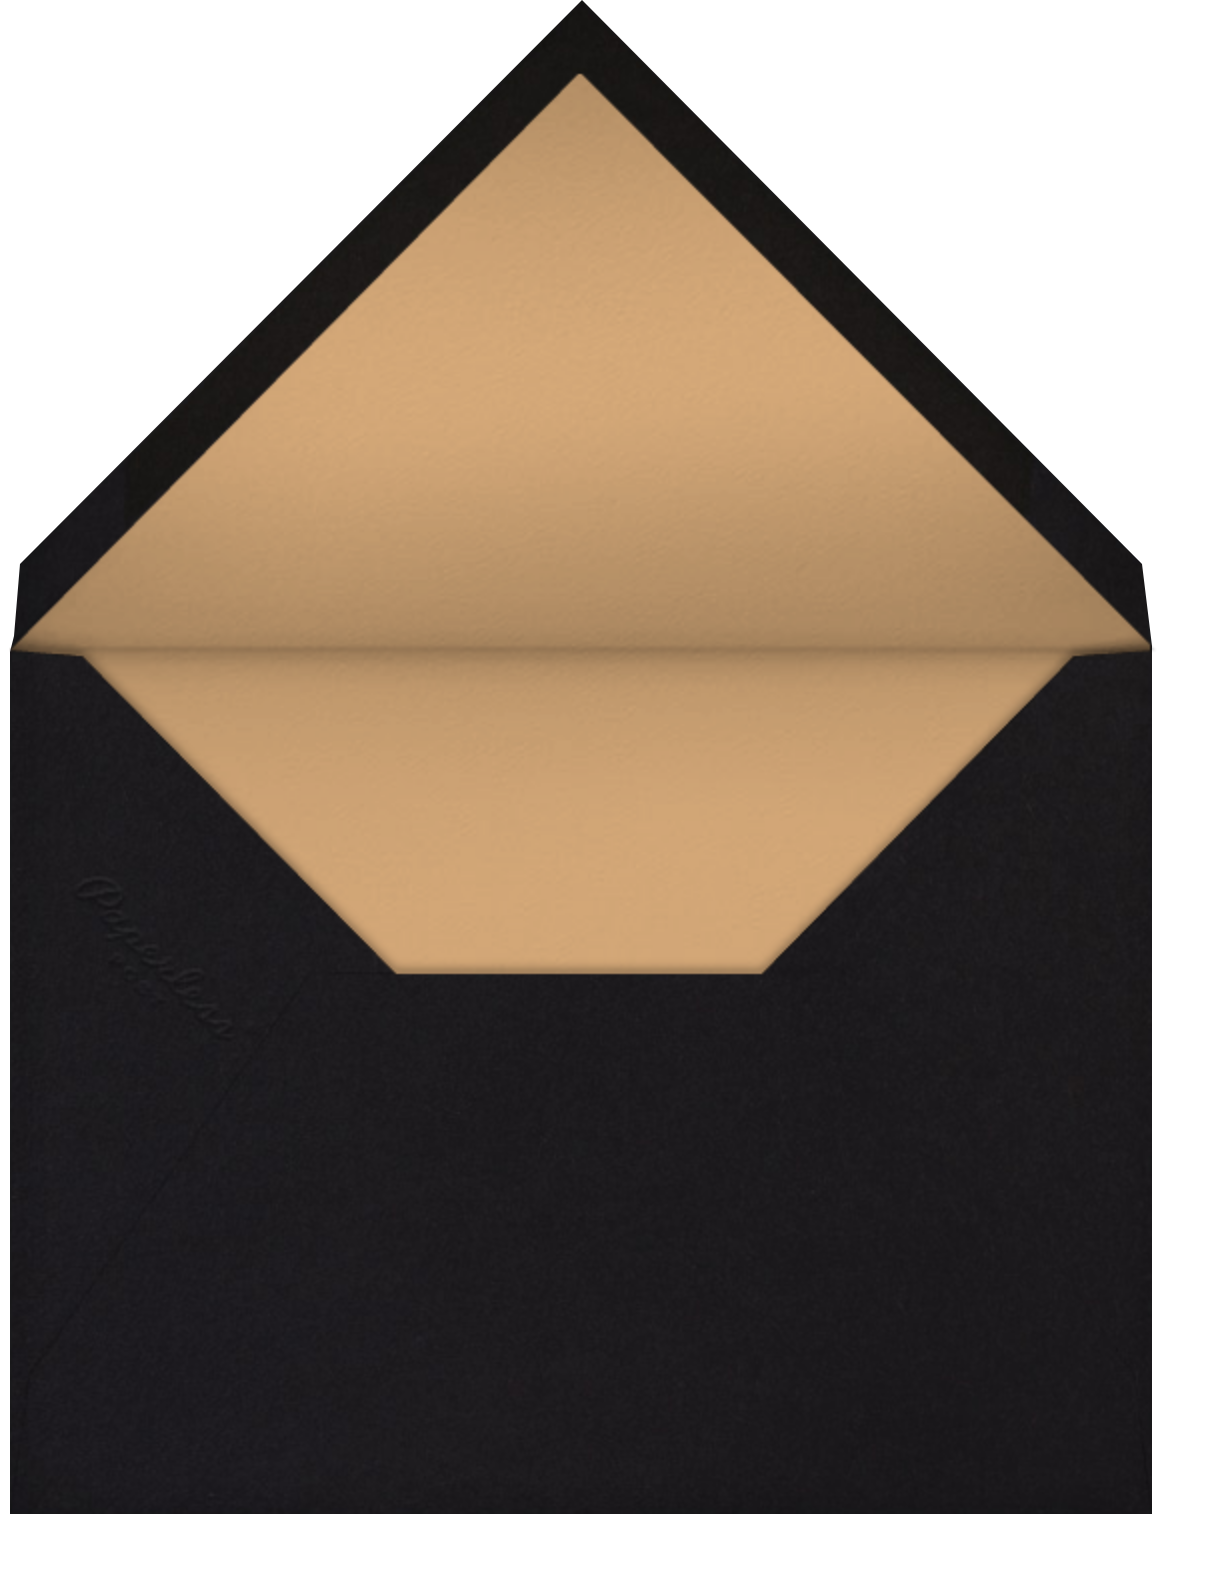 A Cheesy Card - Derek Blasberg - Just because - envelope back